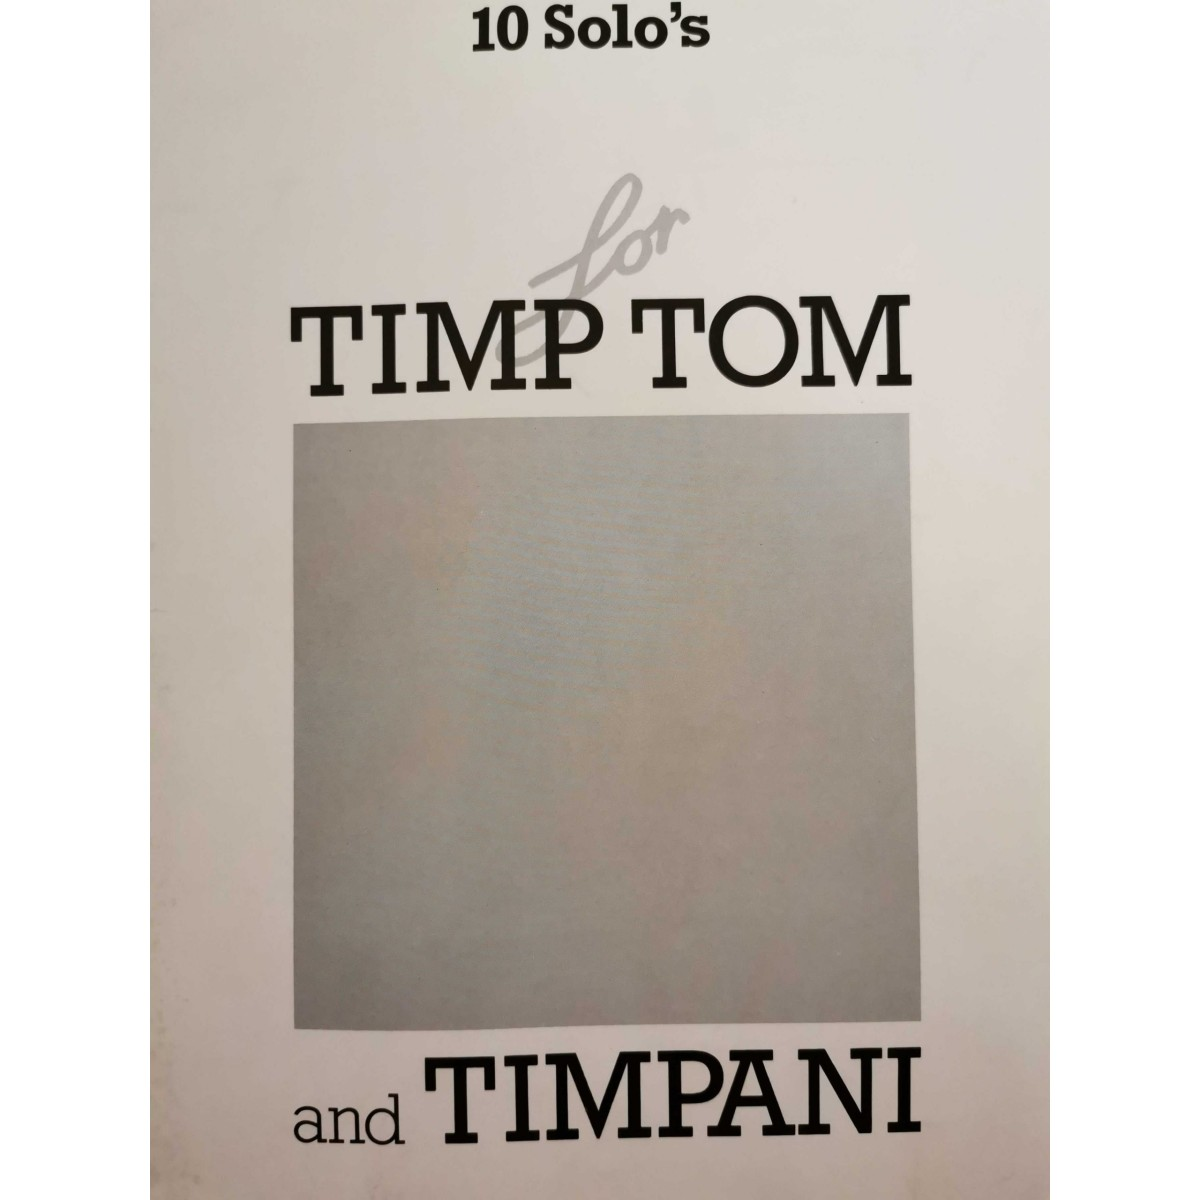 10 Solo's for Timp Tom vol. 1 by Jelmo Piovesana